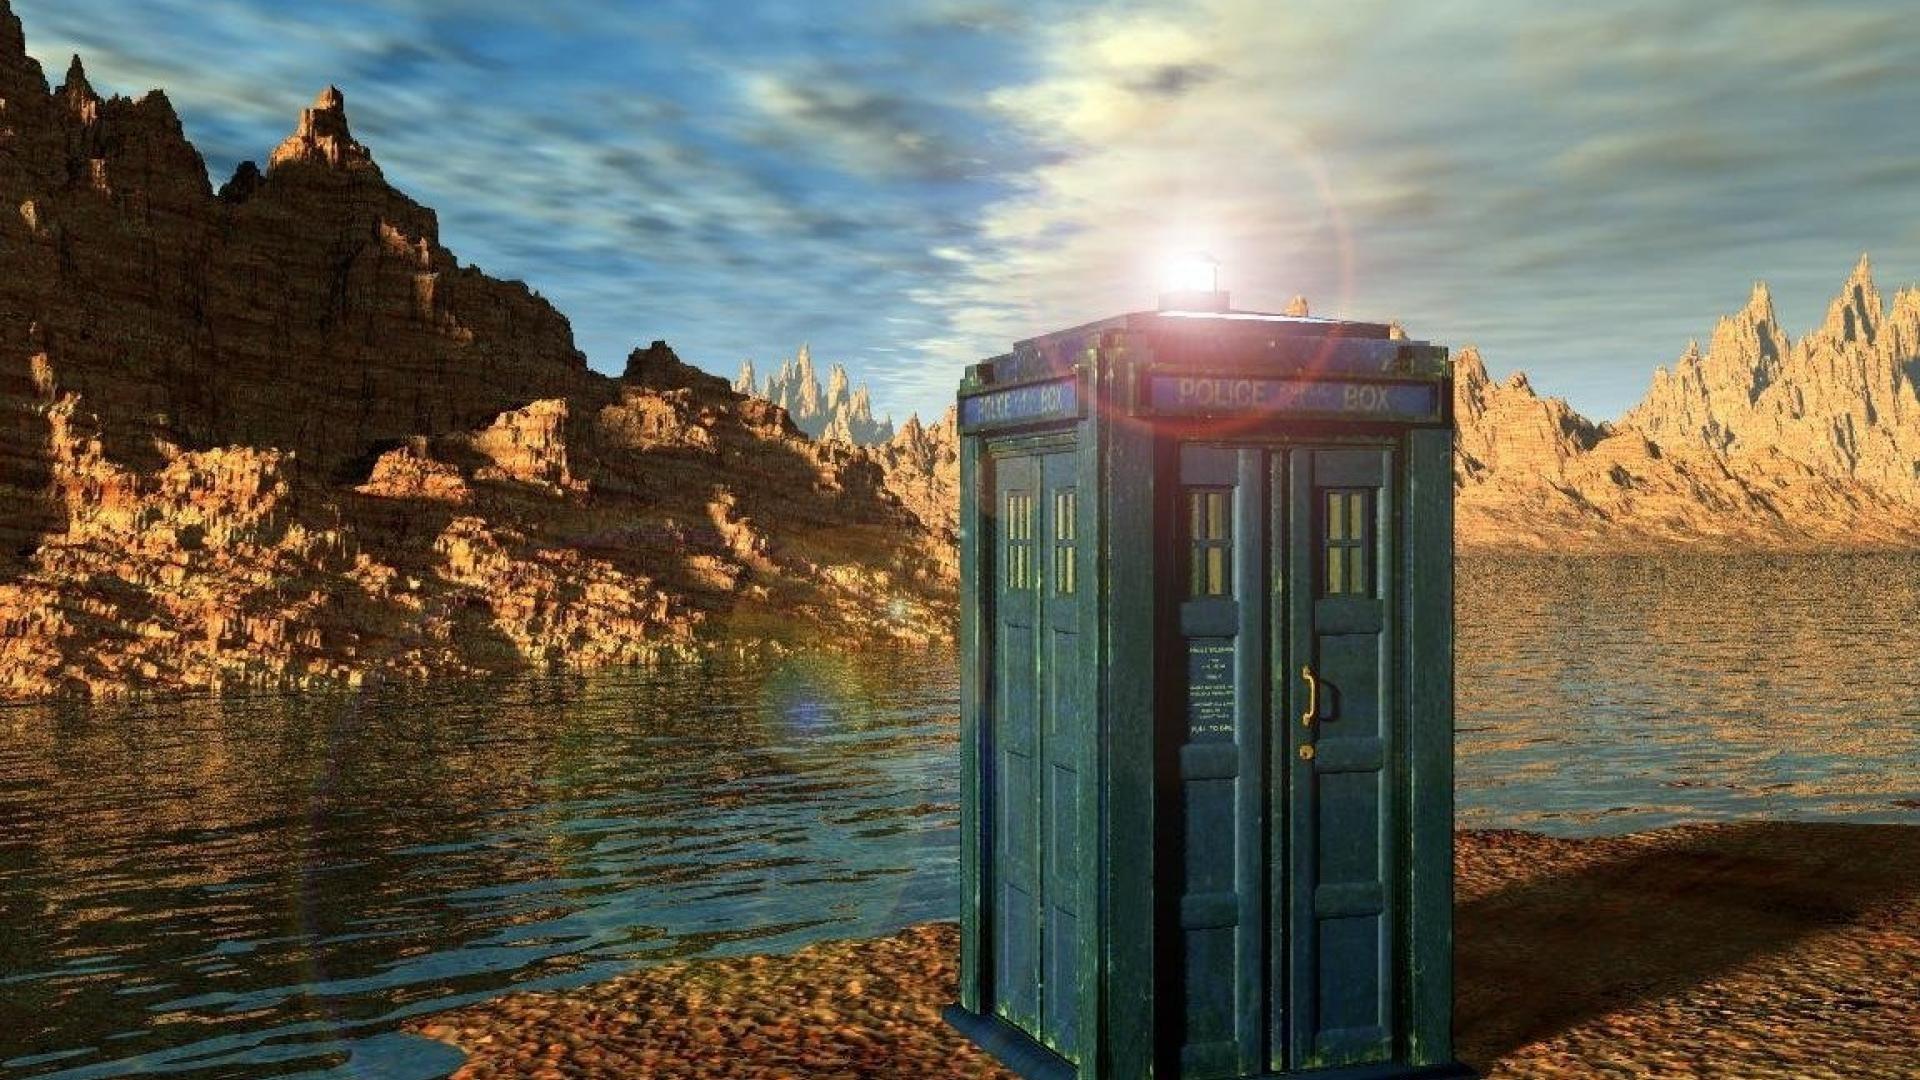 tardis doctor who movies phone box hd wallpaper – (#26349) – HQ .